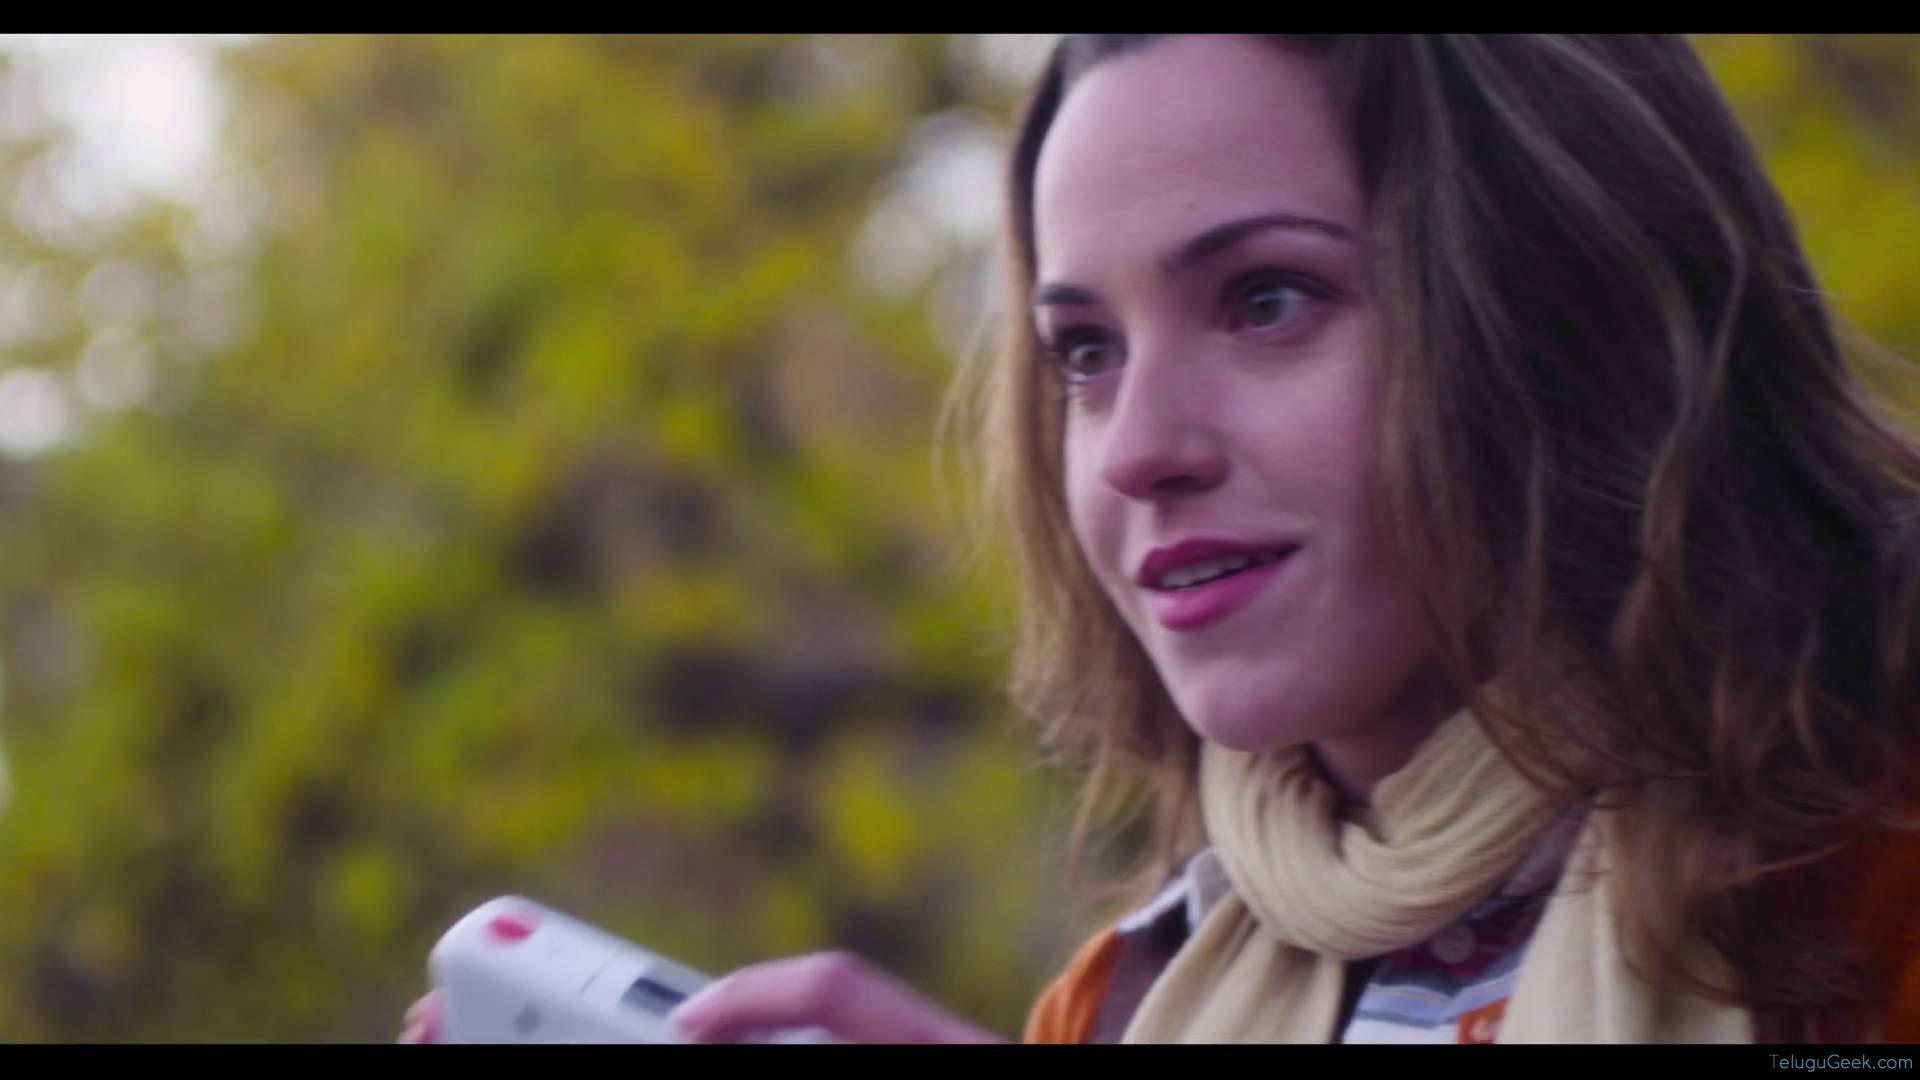 Polaroid Snap: ఒకప్పటి పోలరాయిడ్ కు స్మార్ట్ టచ్